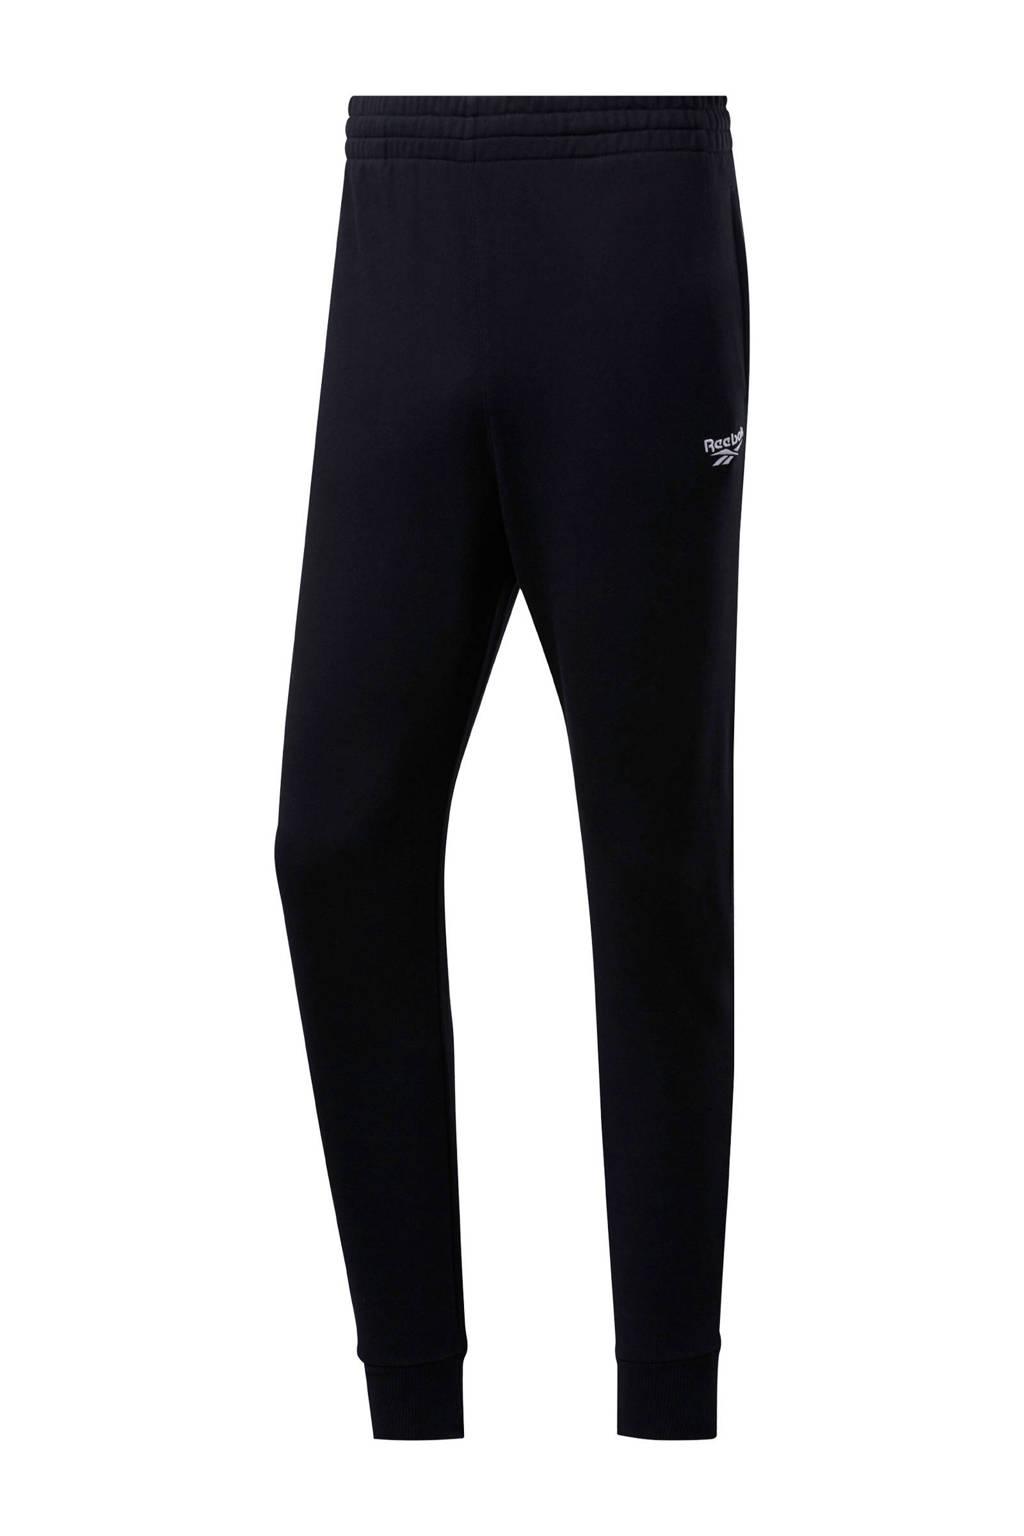 Reebok Classics joggingbroek zwart, Zwart